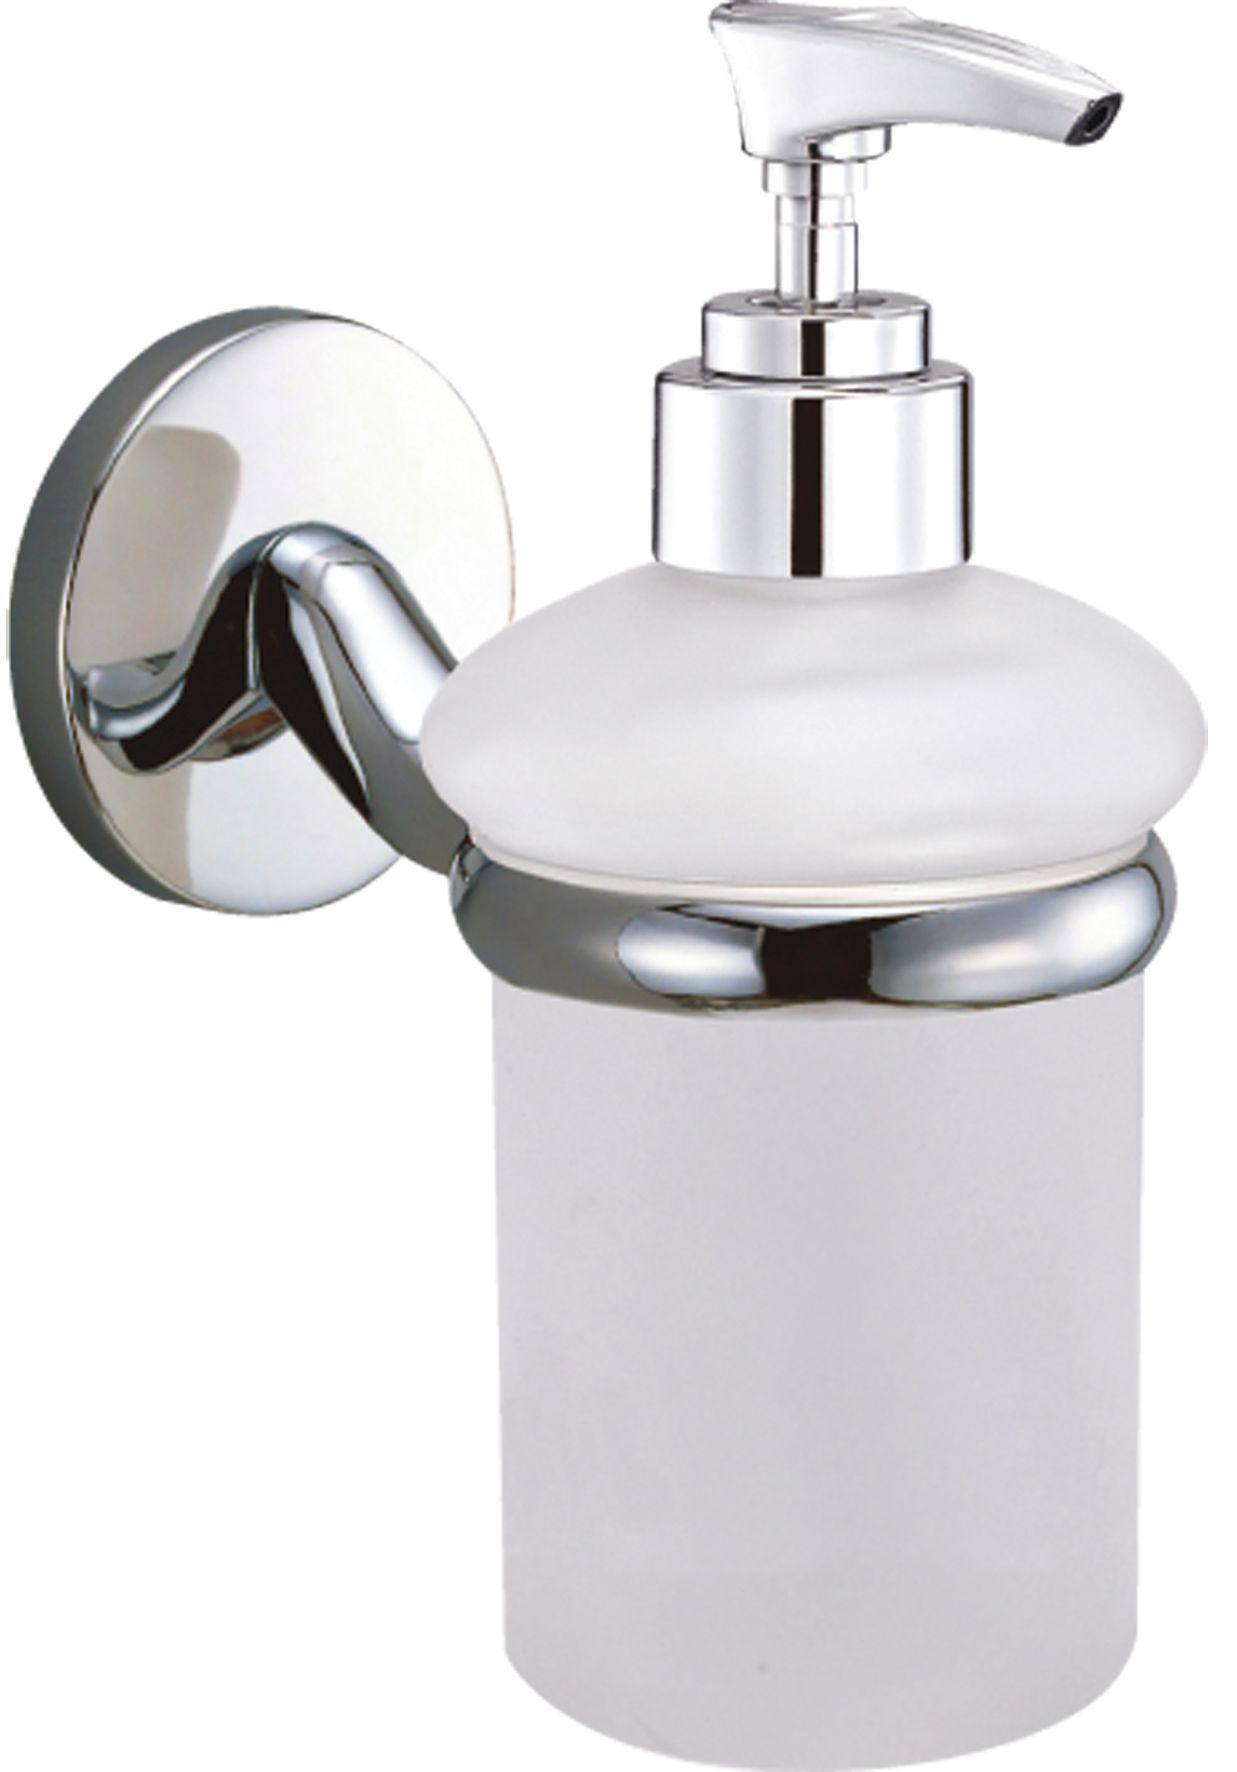 bu0026q curve white chrome effect wall mounted soap dispenser departments diy at bu0026q